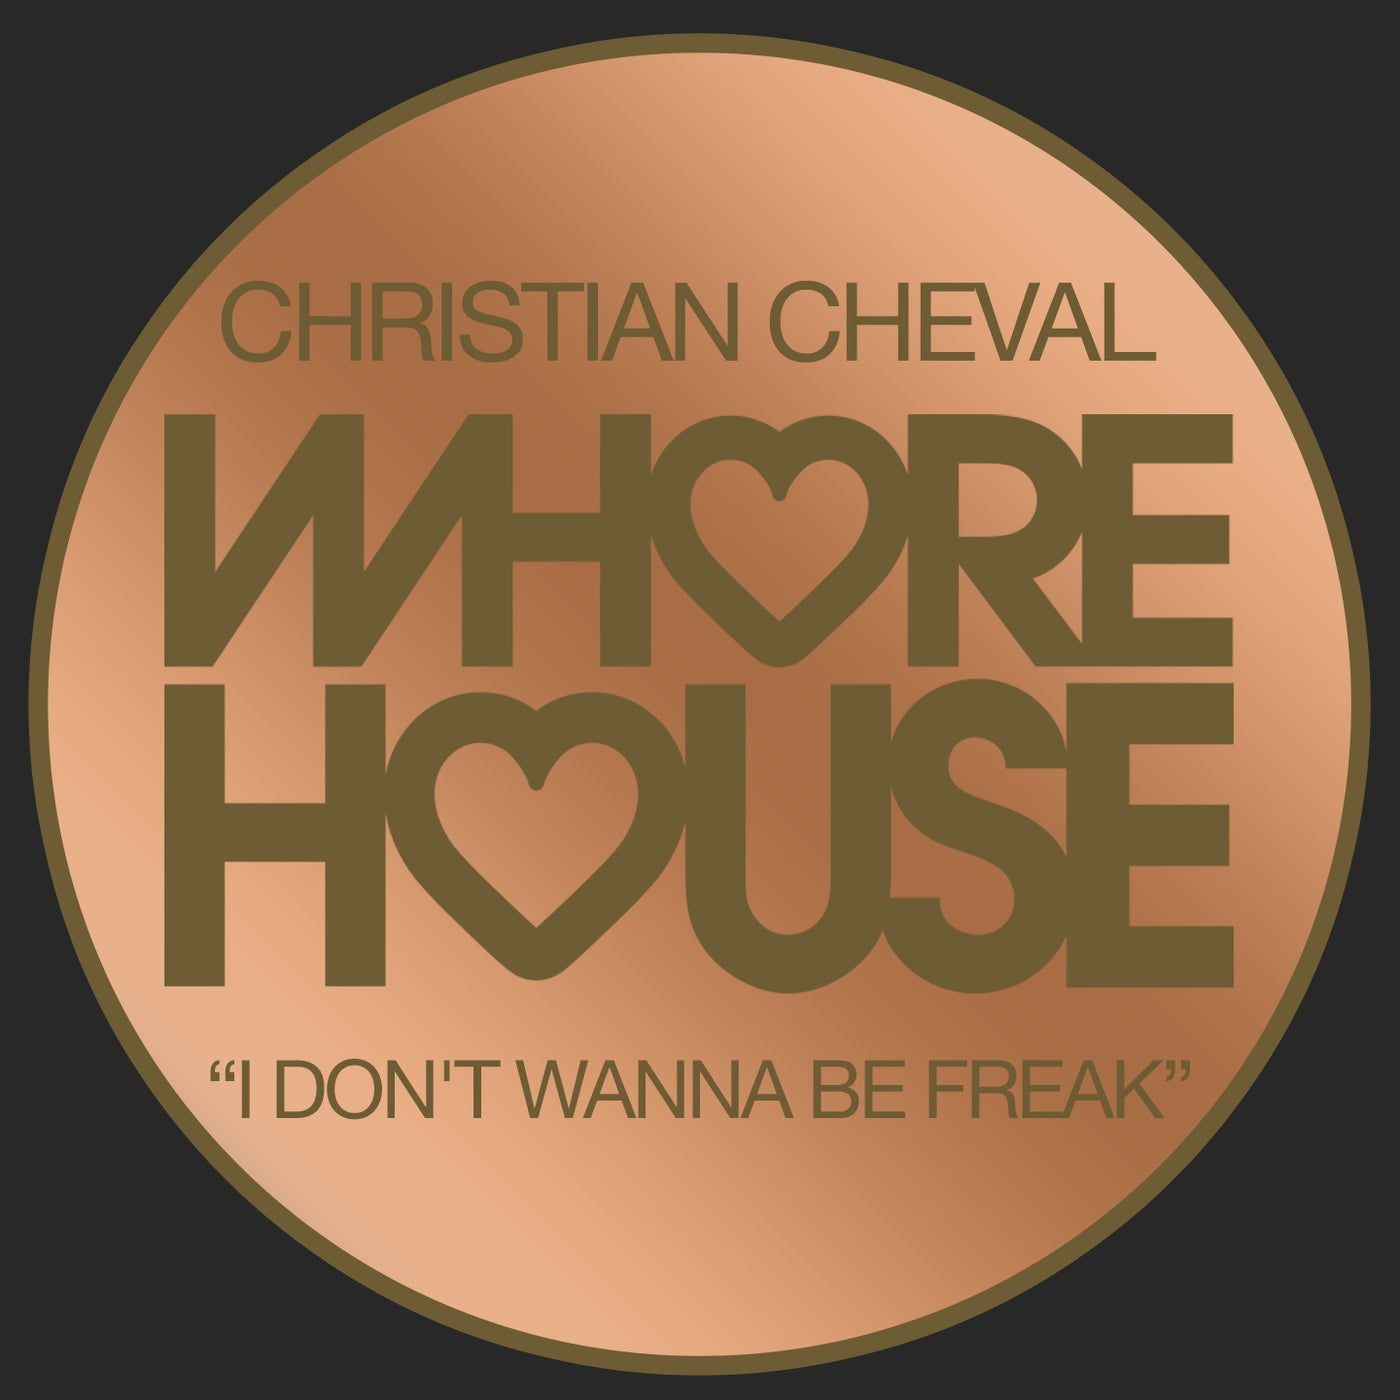 I Don't Wanna Be Freak (Original Mix)